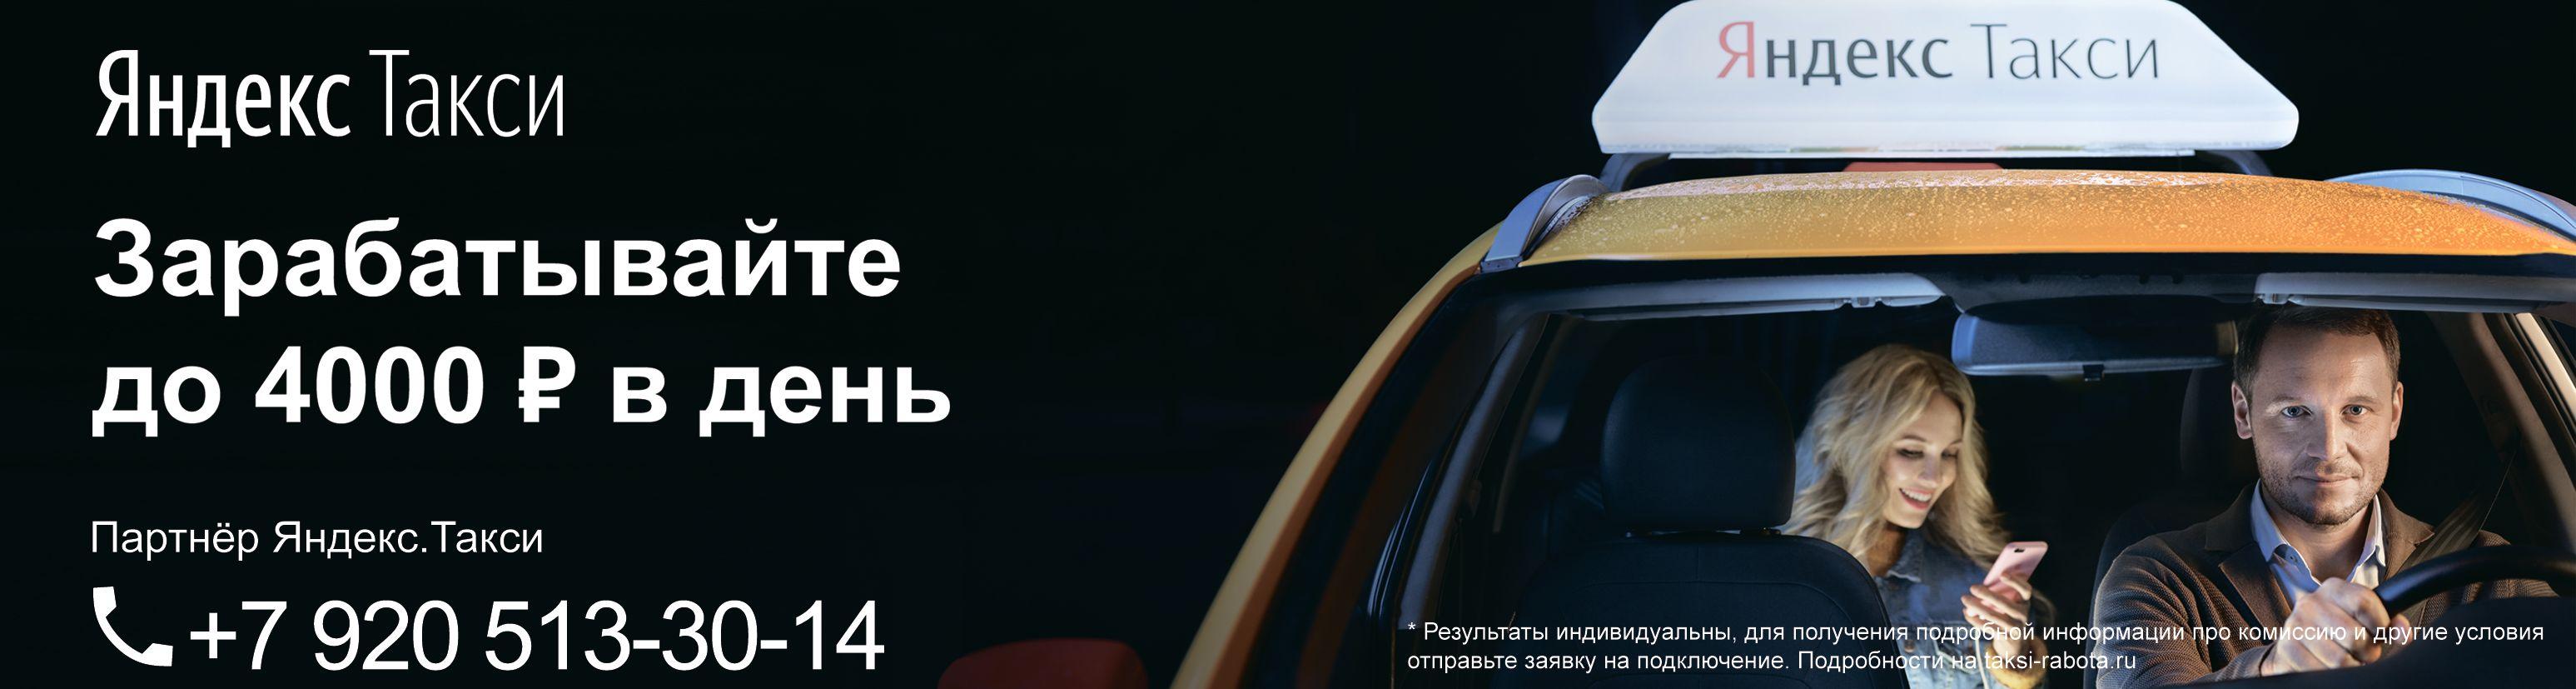 ПОДКЛЮЧЕНИЕ ВОДИТЕЛЕЙ К СЕРВИСУ ЯНДЕКС-ТАКСИ  Тел. 8 (920) 513-30-14